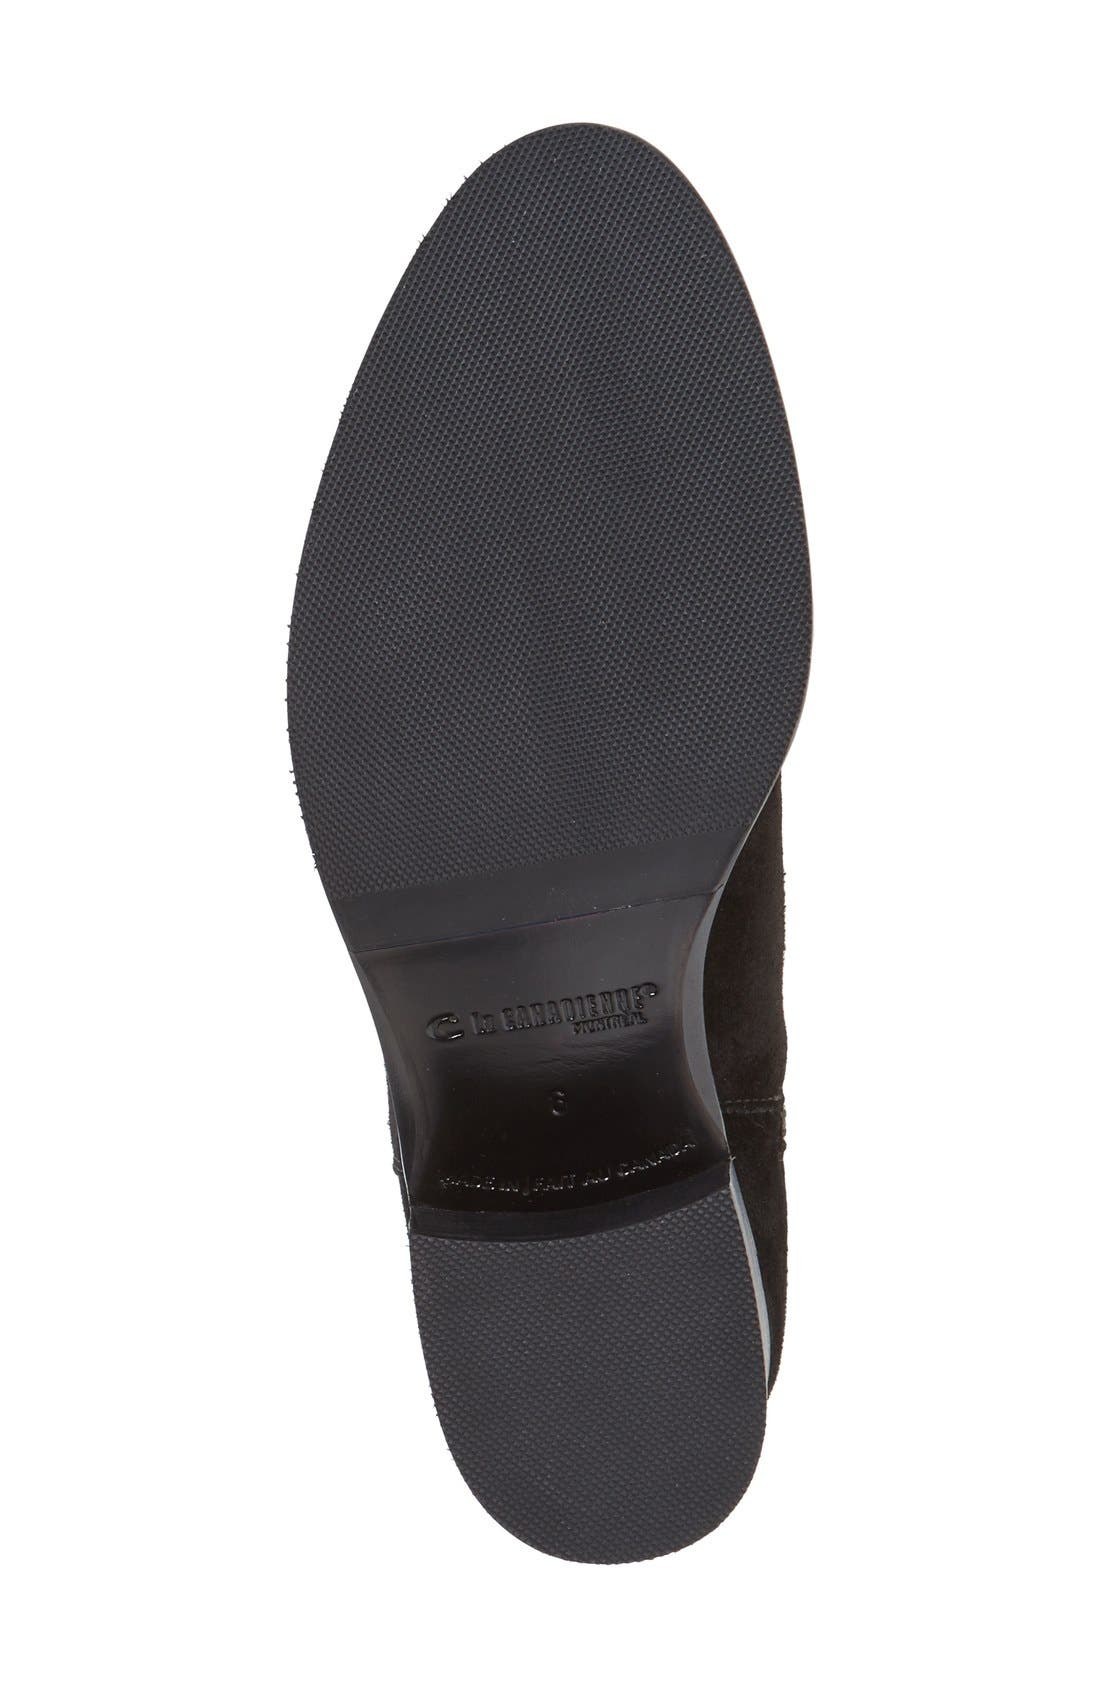 Alternate Image 4  - La Canadienne 'Polly' Waterproof Knee High Boot (Women)